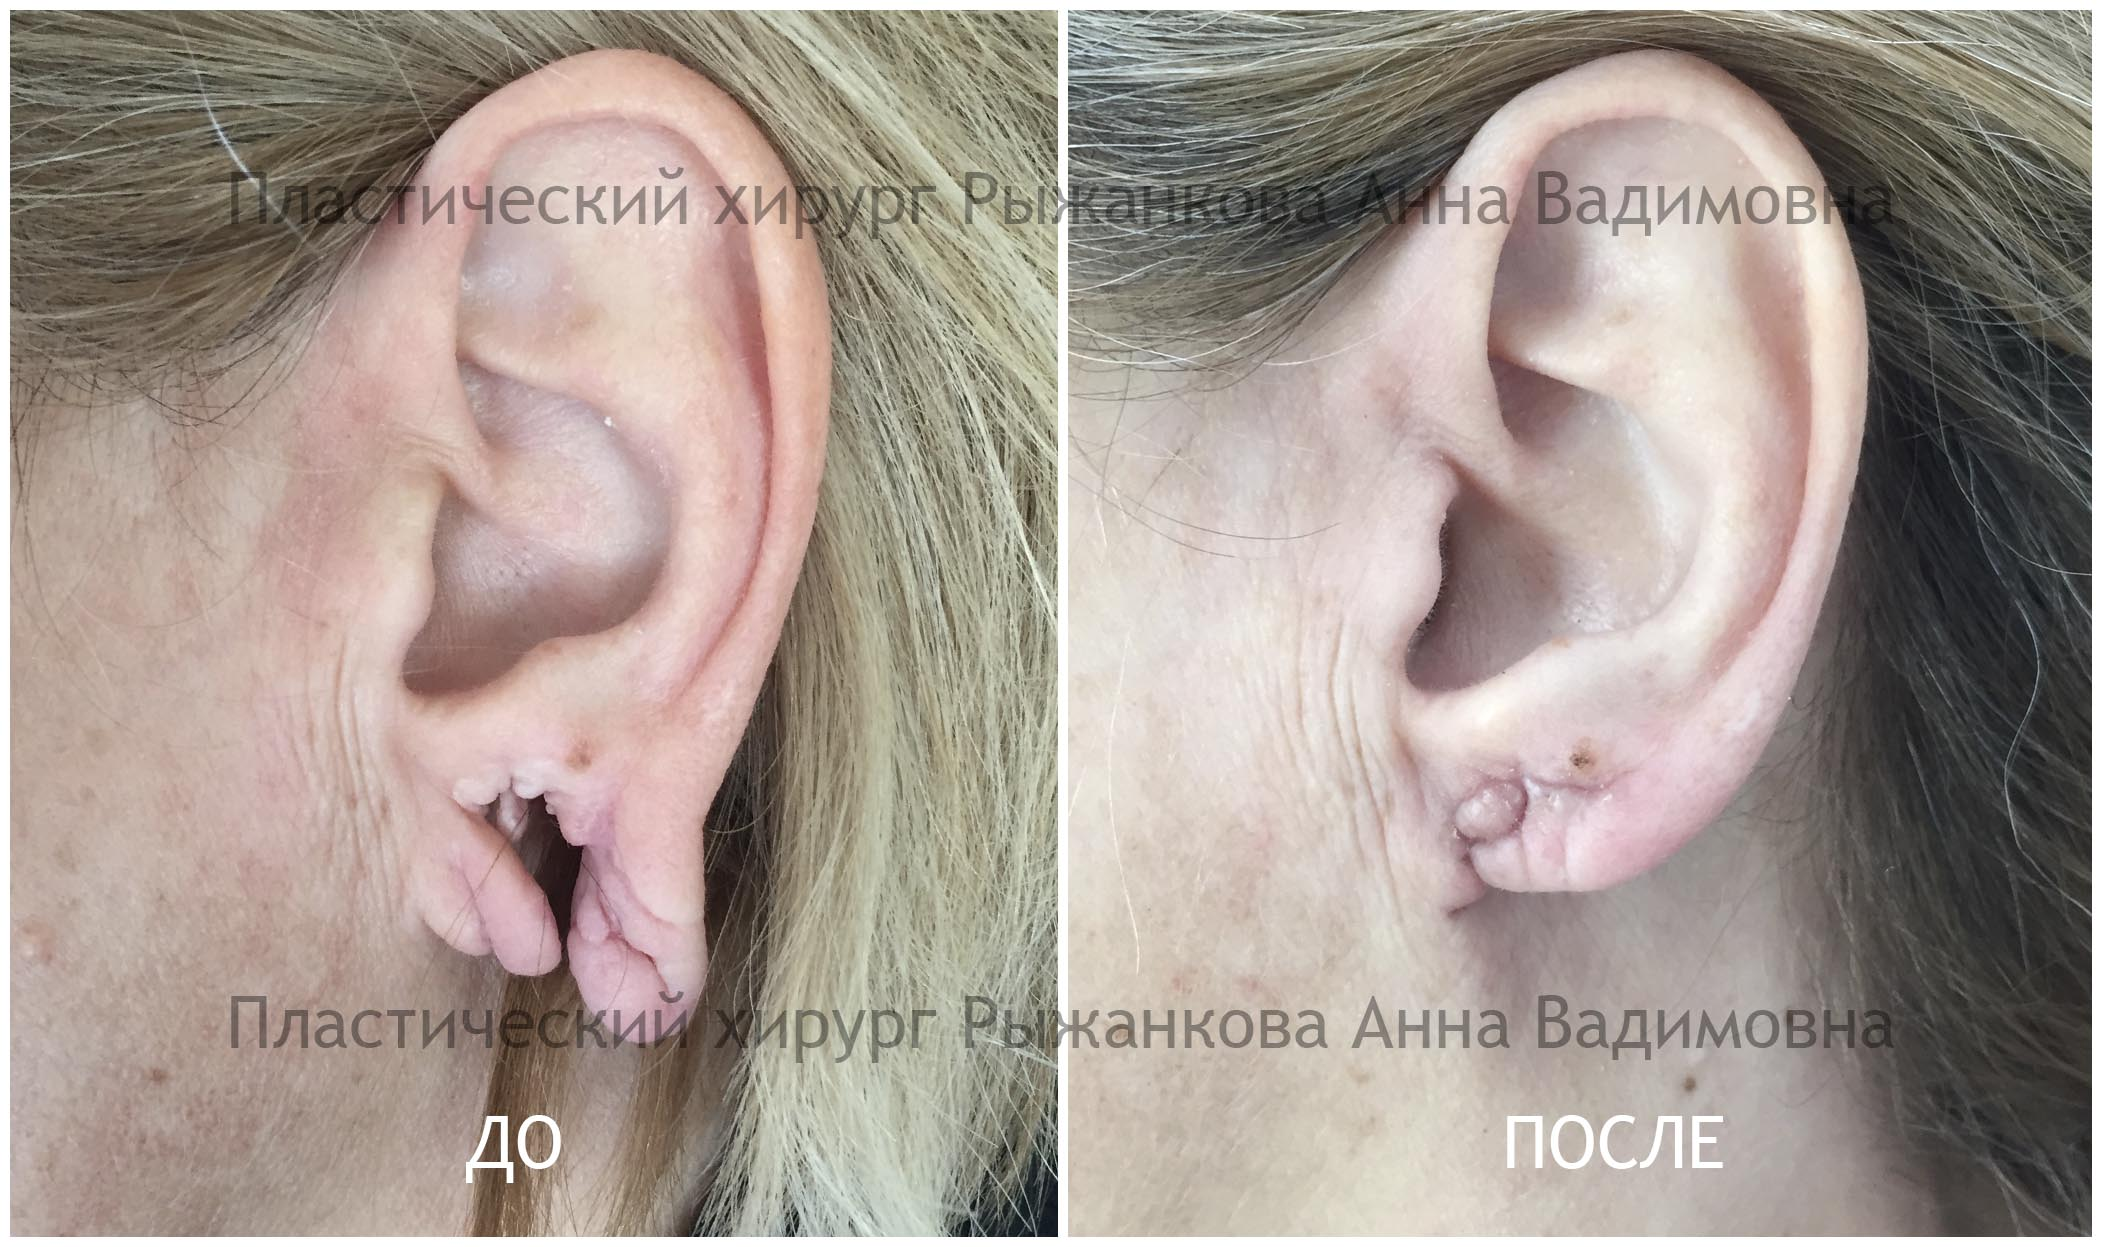 Коррекция мочки уха Фото До и После